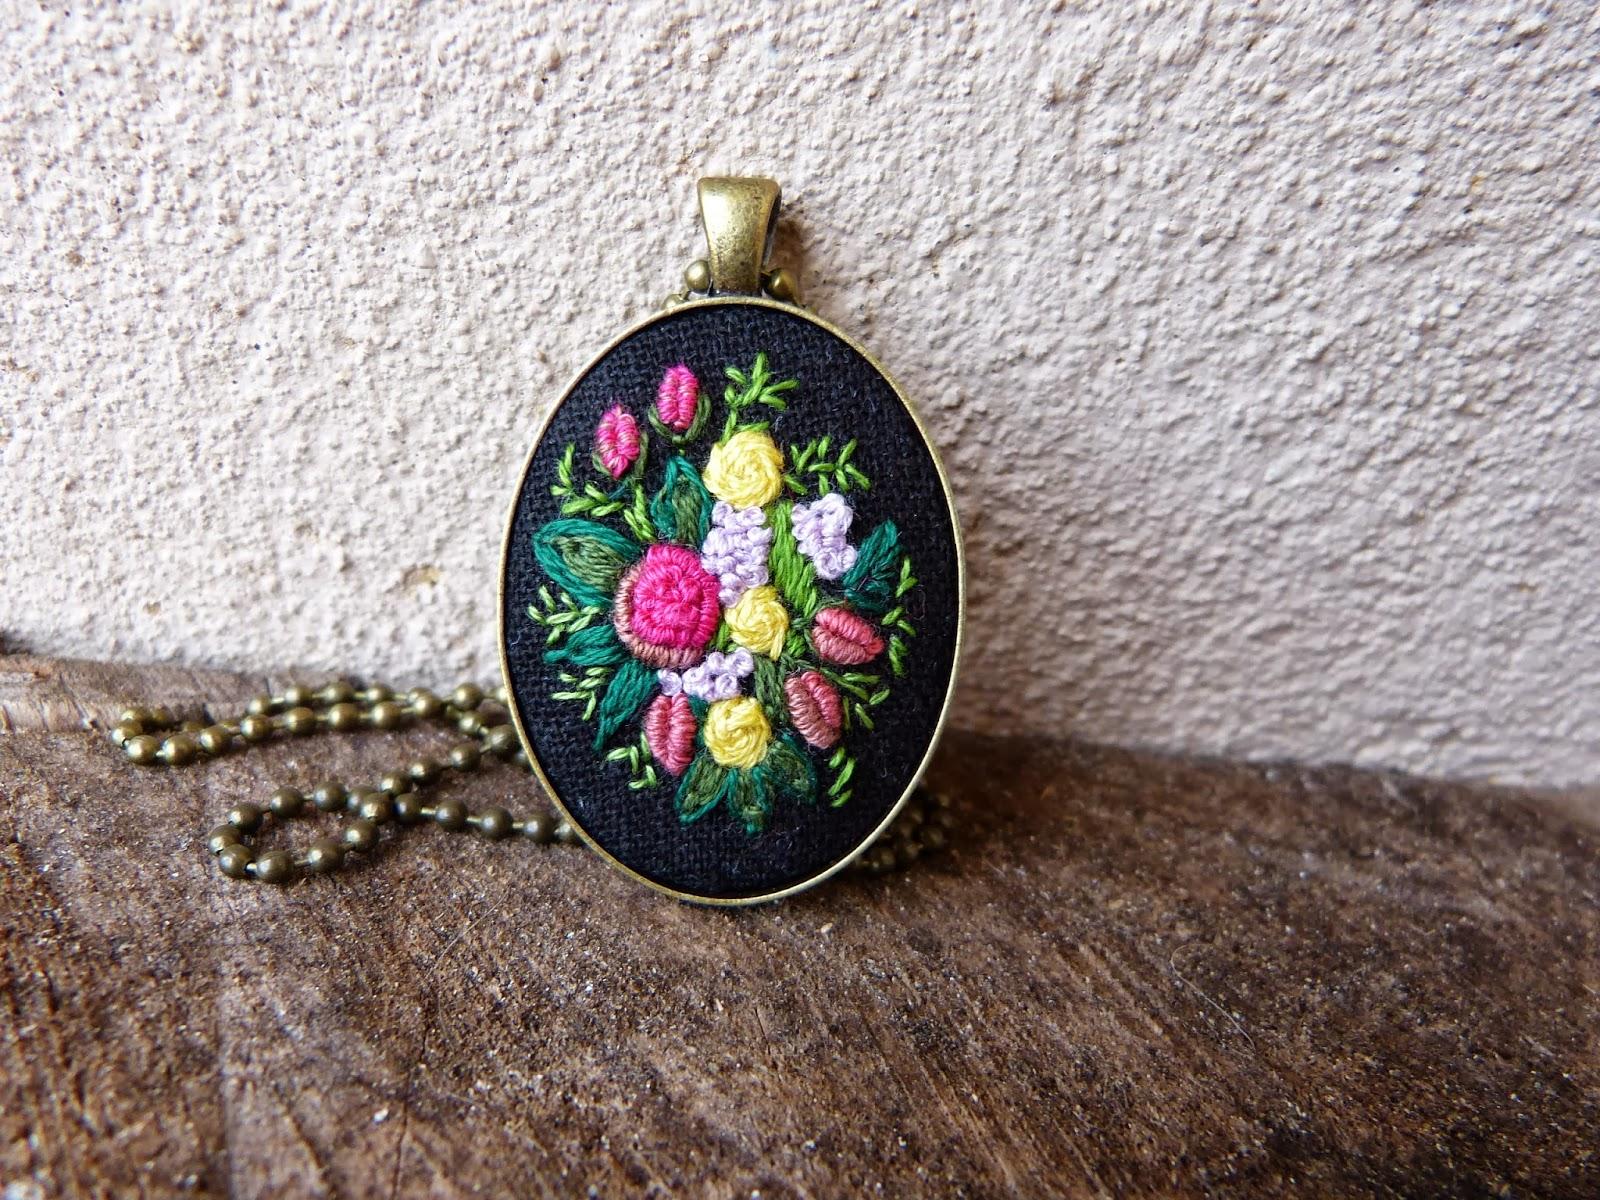 haft rococo, embroidered pendant, haftowane róże, haftowany naszyjnik, naszyjnik z haftem, embroidered jewerly, naszyjnik vintage, medalion z haftem, handmade jewerly,